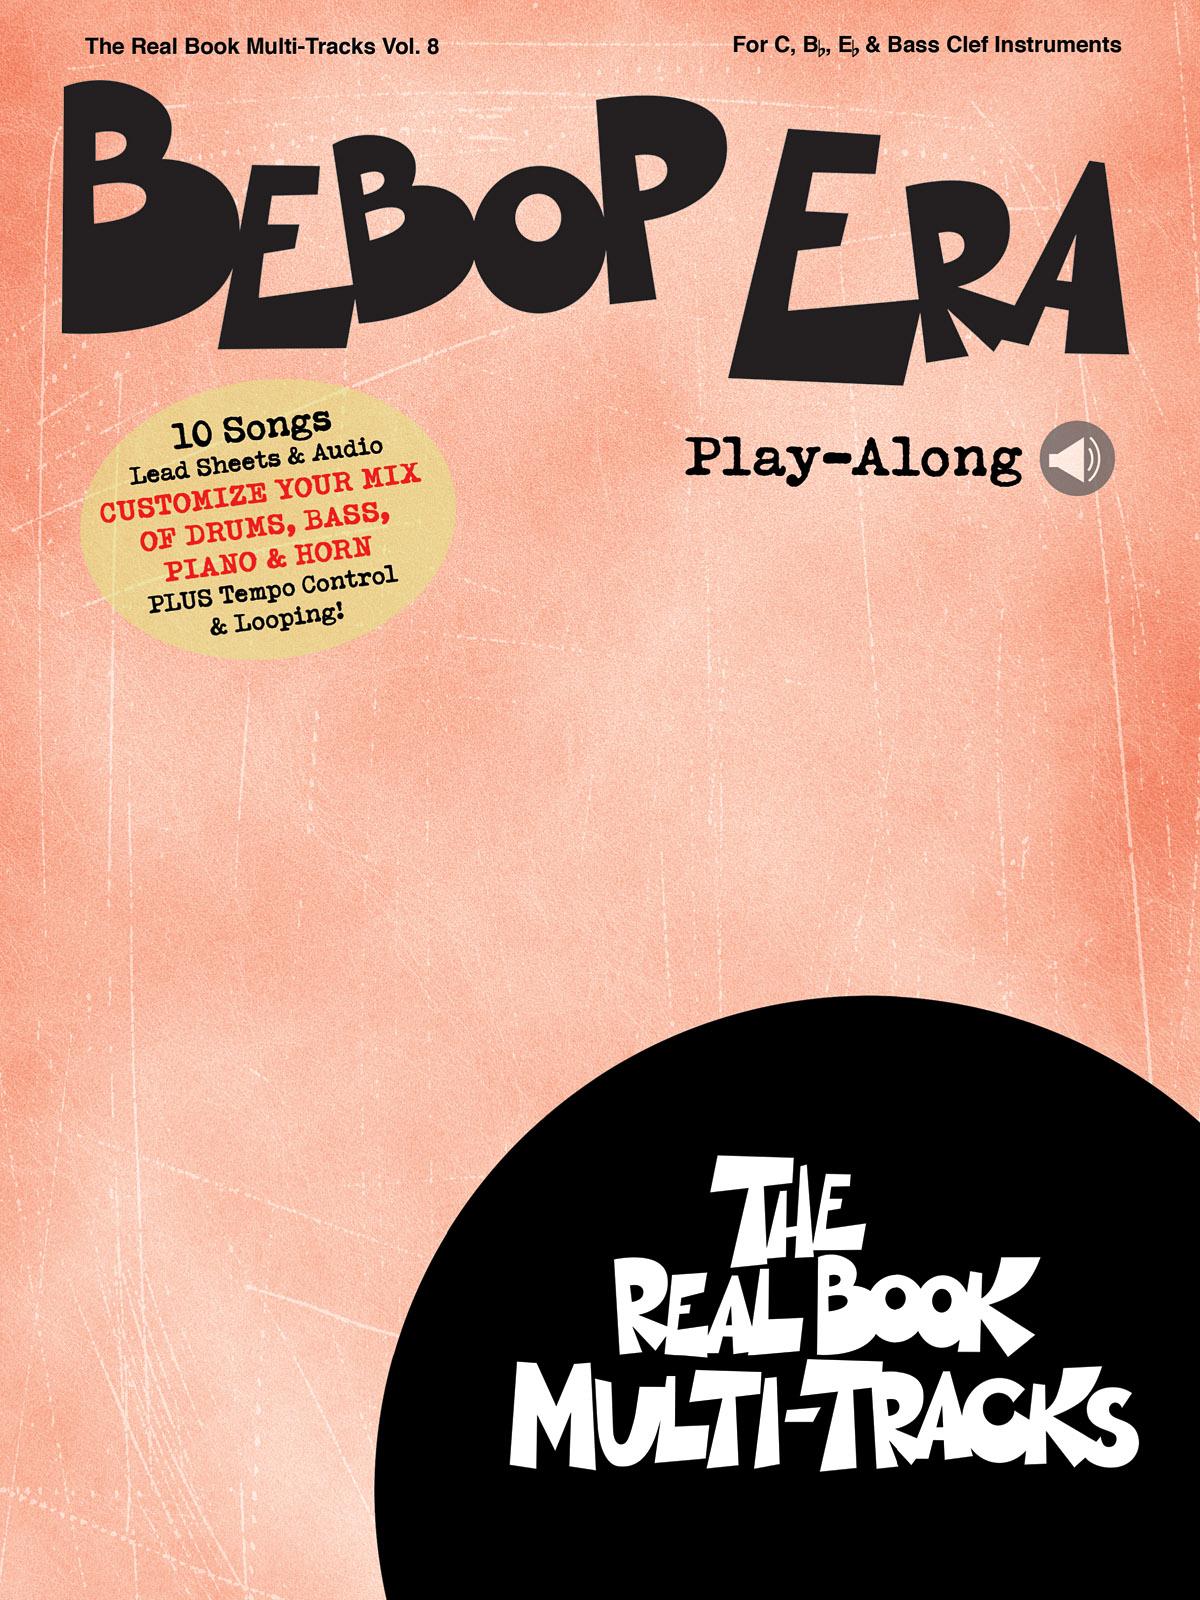 Bebop Era Play-Along: Other Variations: Instrumental Album